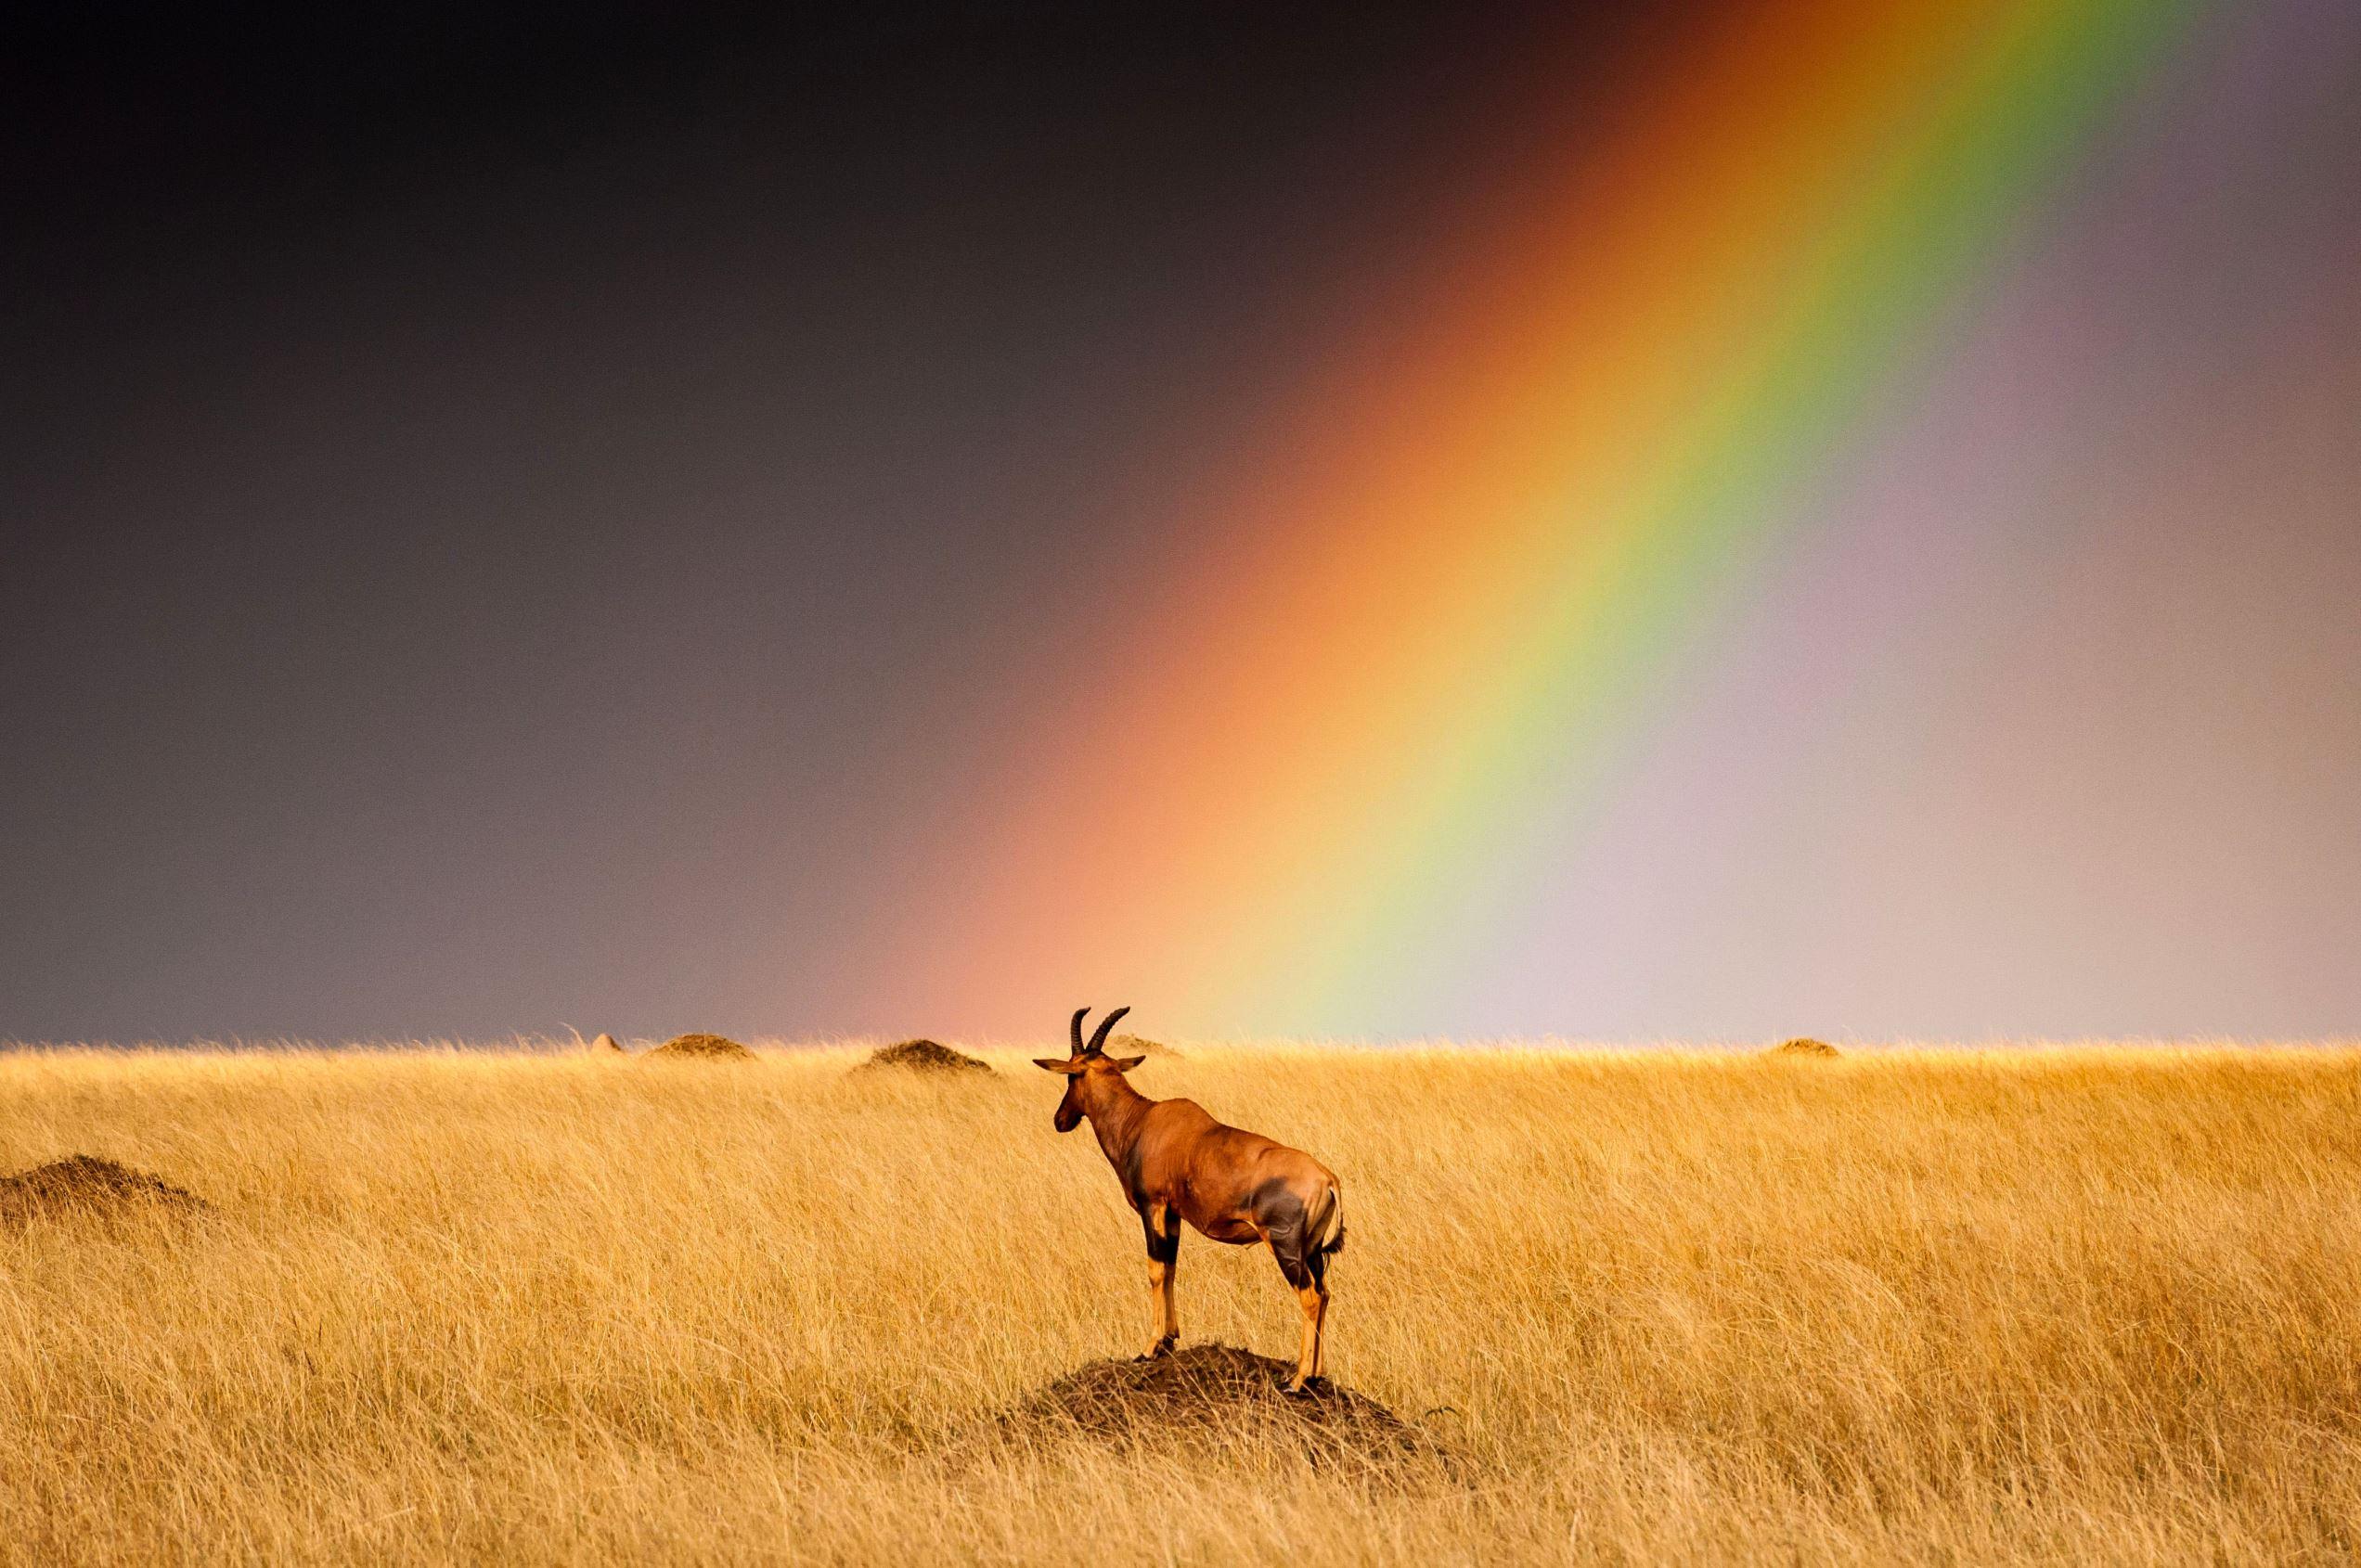 Слайд 8 из 67: Kenya Masai Mara Nature Reserve, Africa - 24 Aug 2016 Early morning storms on the Kenya Masai Mara Nature Reserve